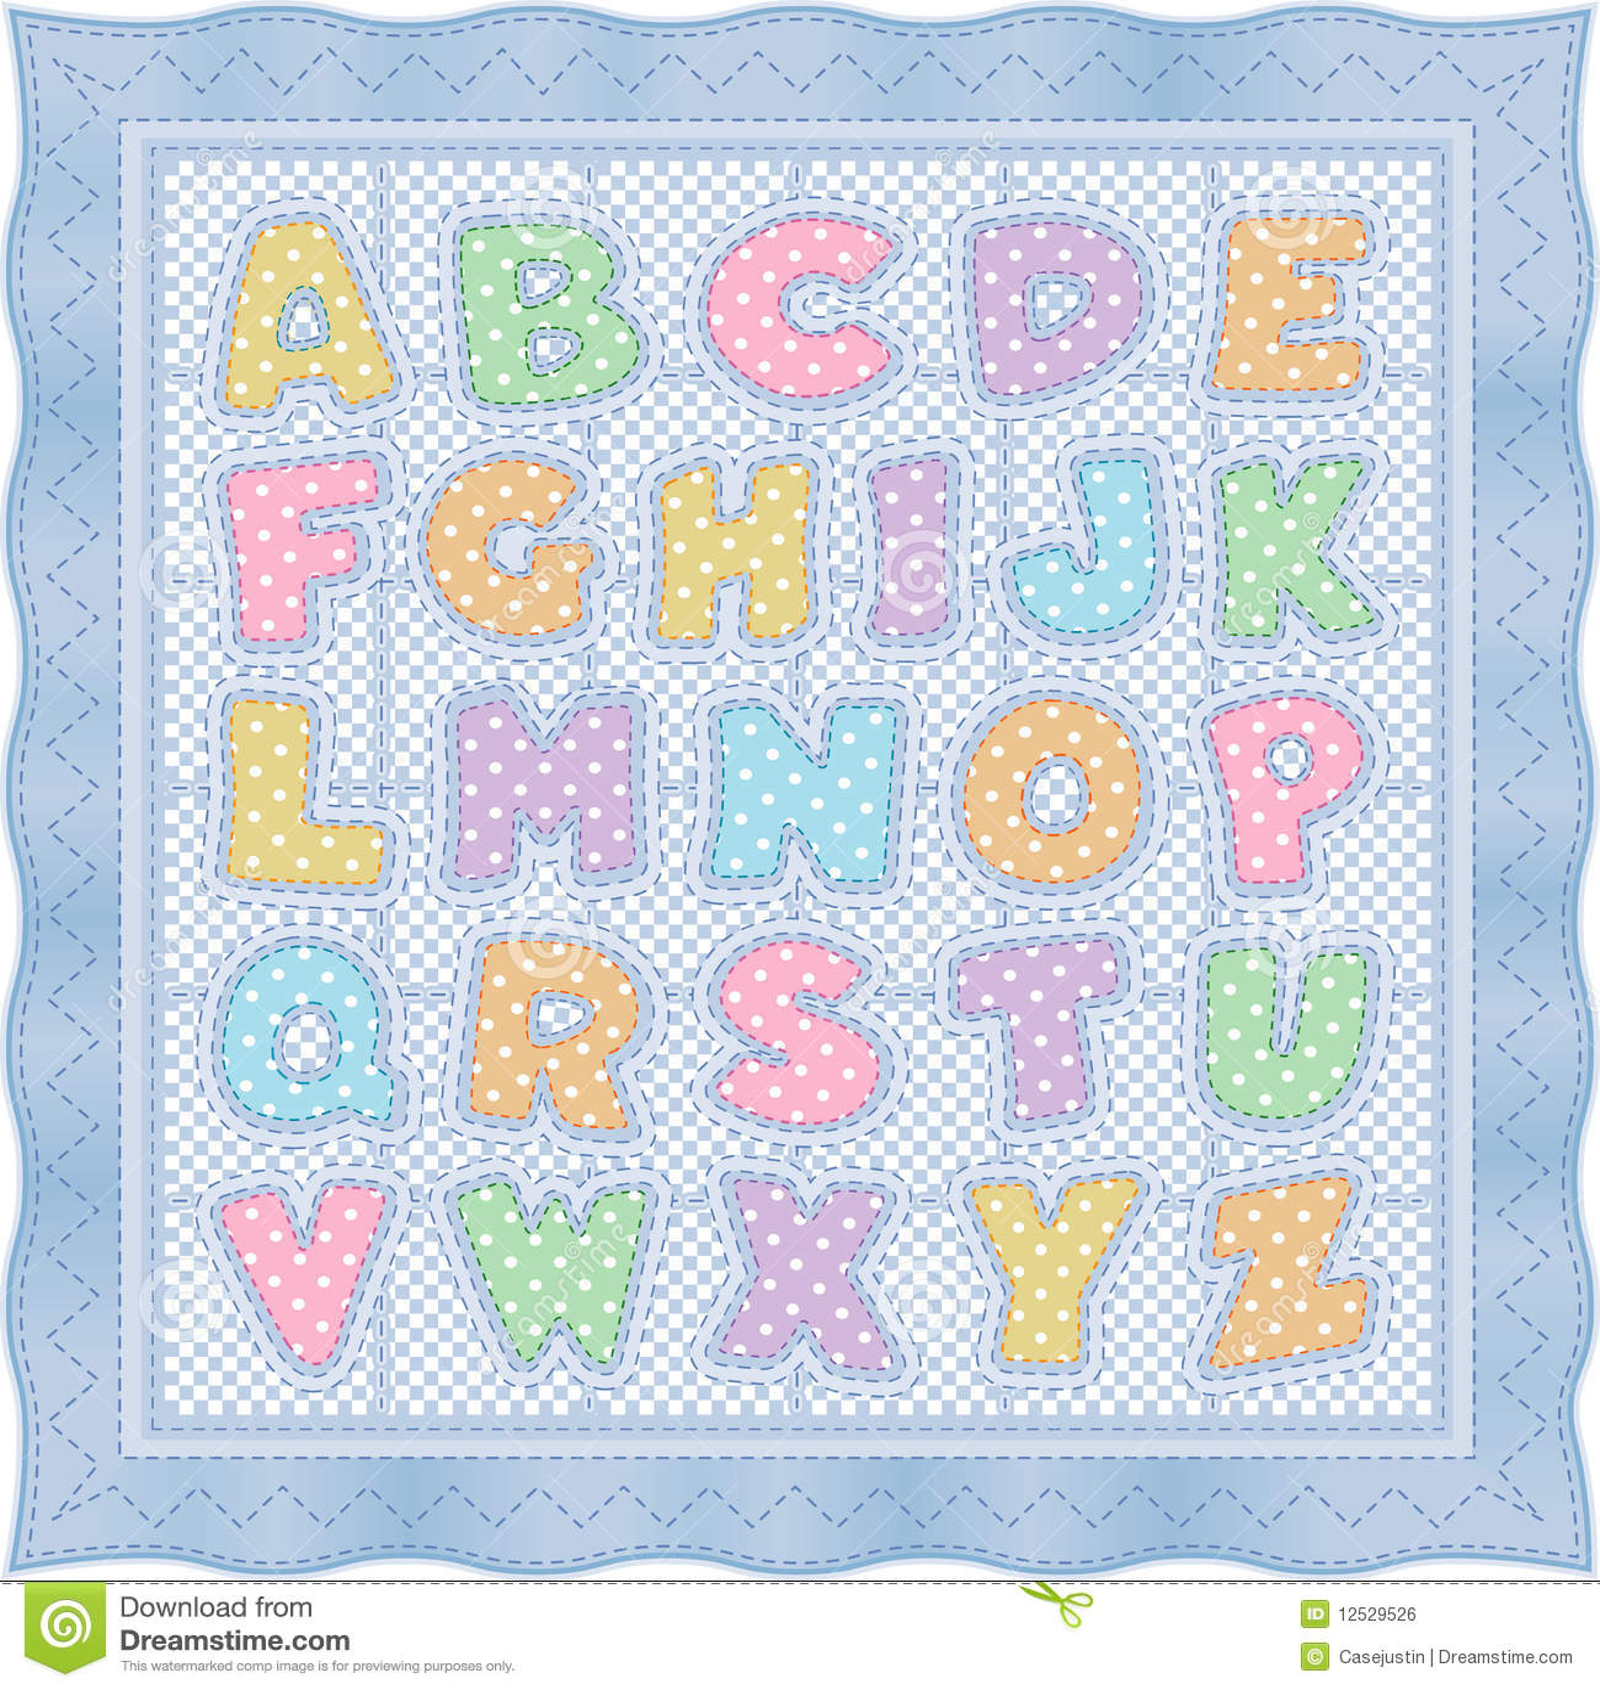 Vintage Baby Quilt Patterns Free : Alphabet Baby Quilt, Blue Pastel Stock Vector - Illustration of craft, illustration: 12529526